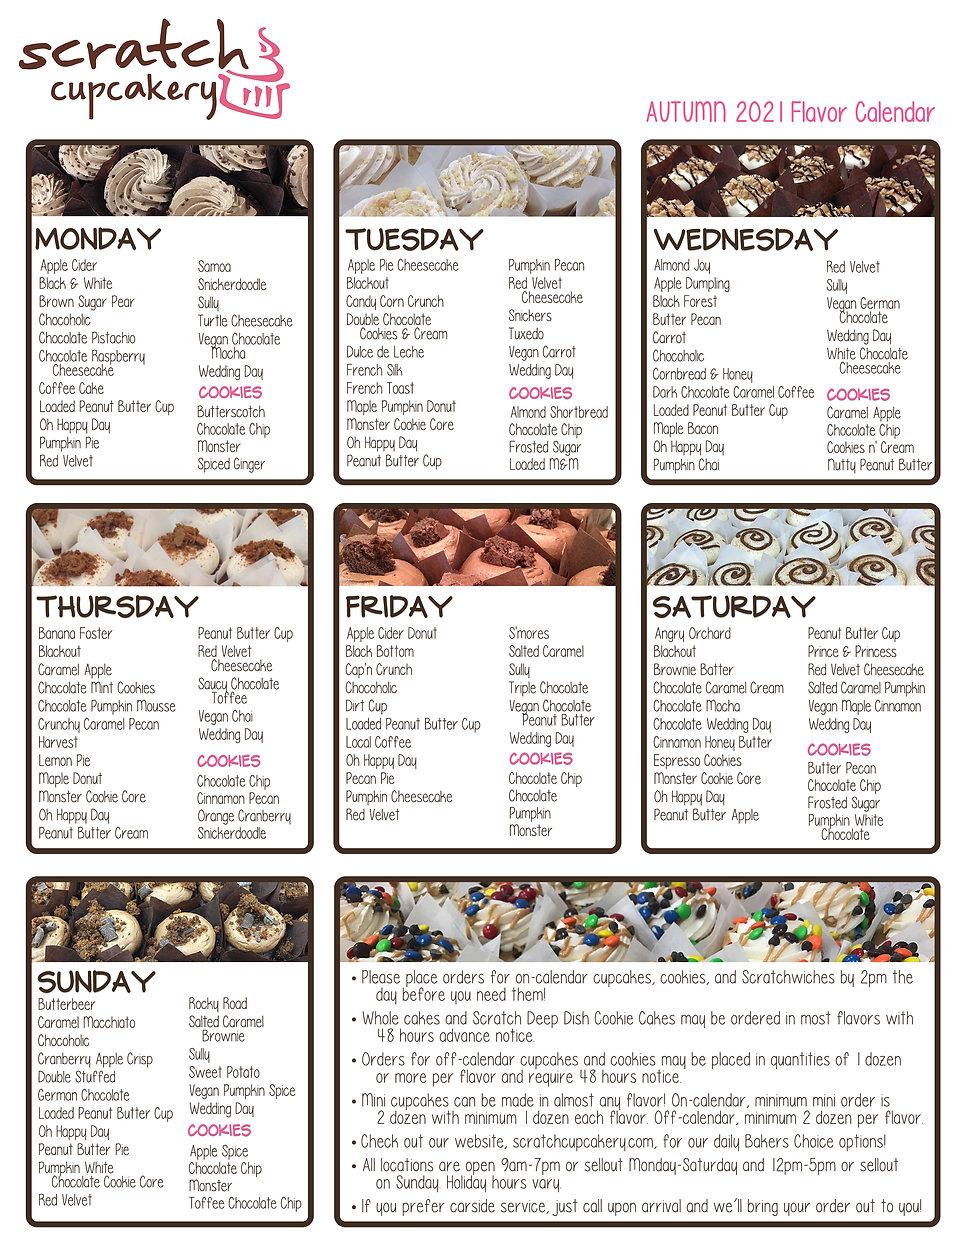 Flavor Calendar Autumn 2021 .jpg